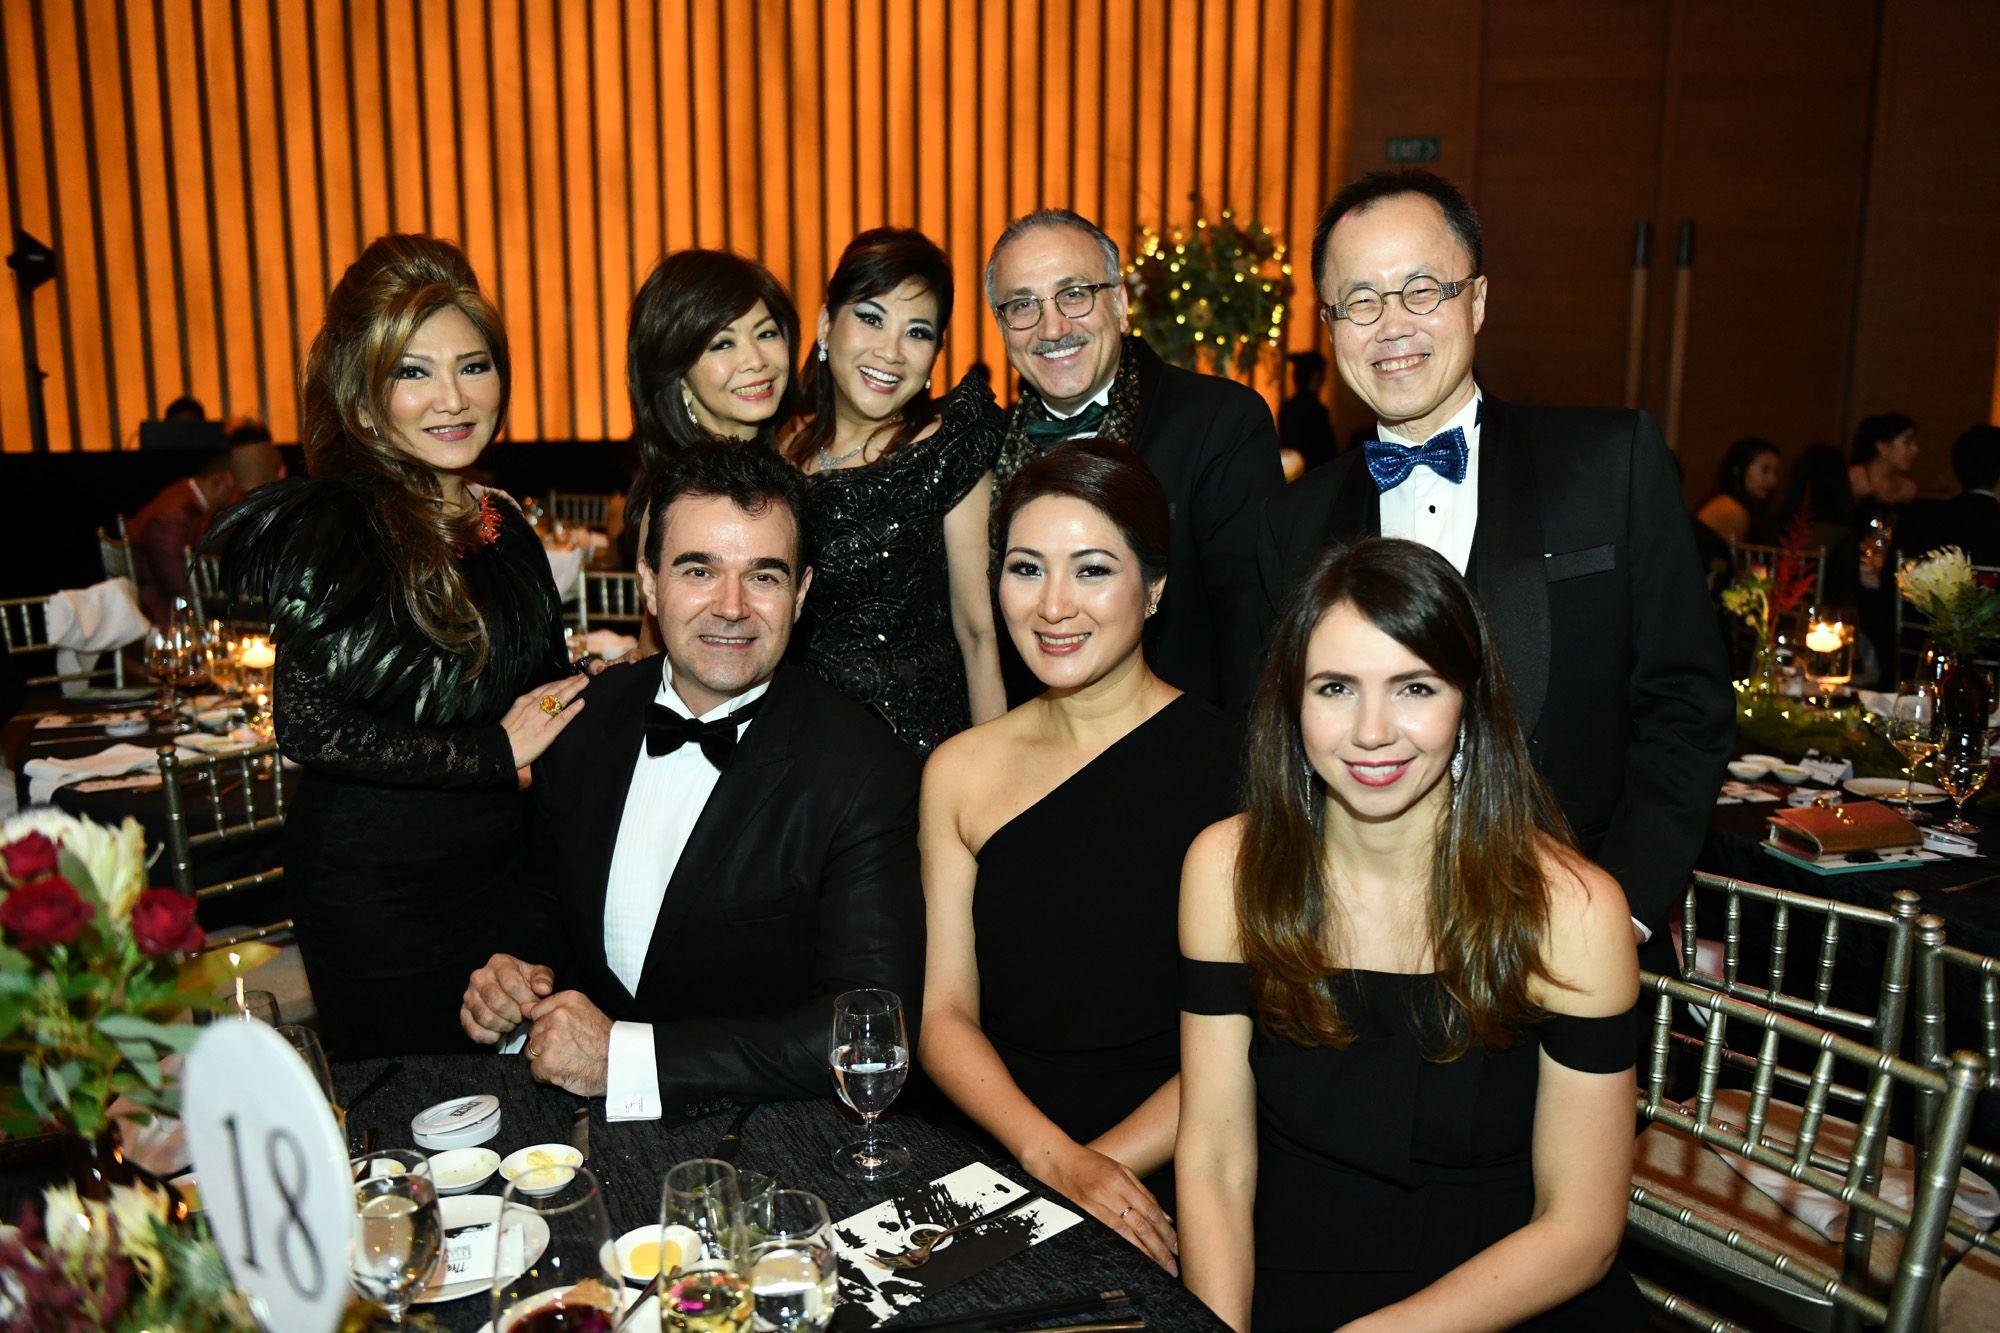 Audrey Mico, Dolly Cheong, Pauline Chan, Jean Nasr, Bernard Cheong, Ana Huang, Nana Au-Chua, Oscar Mico